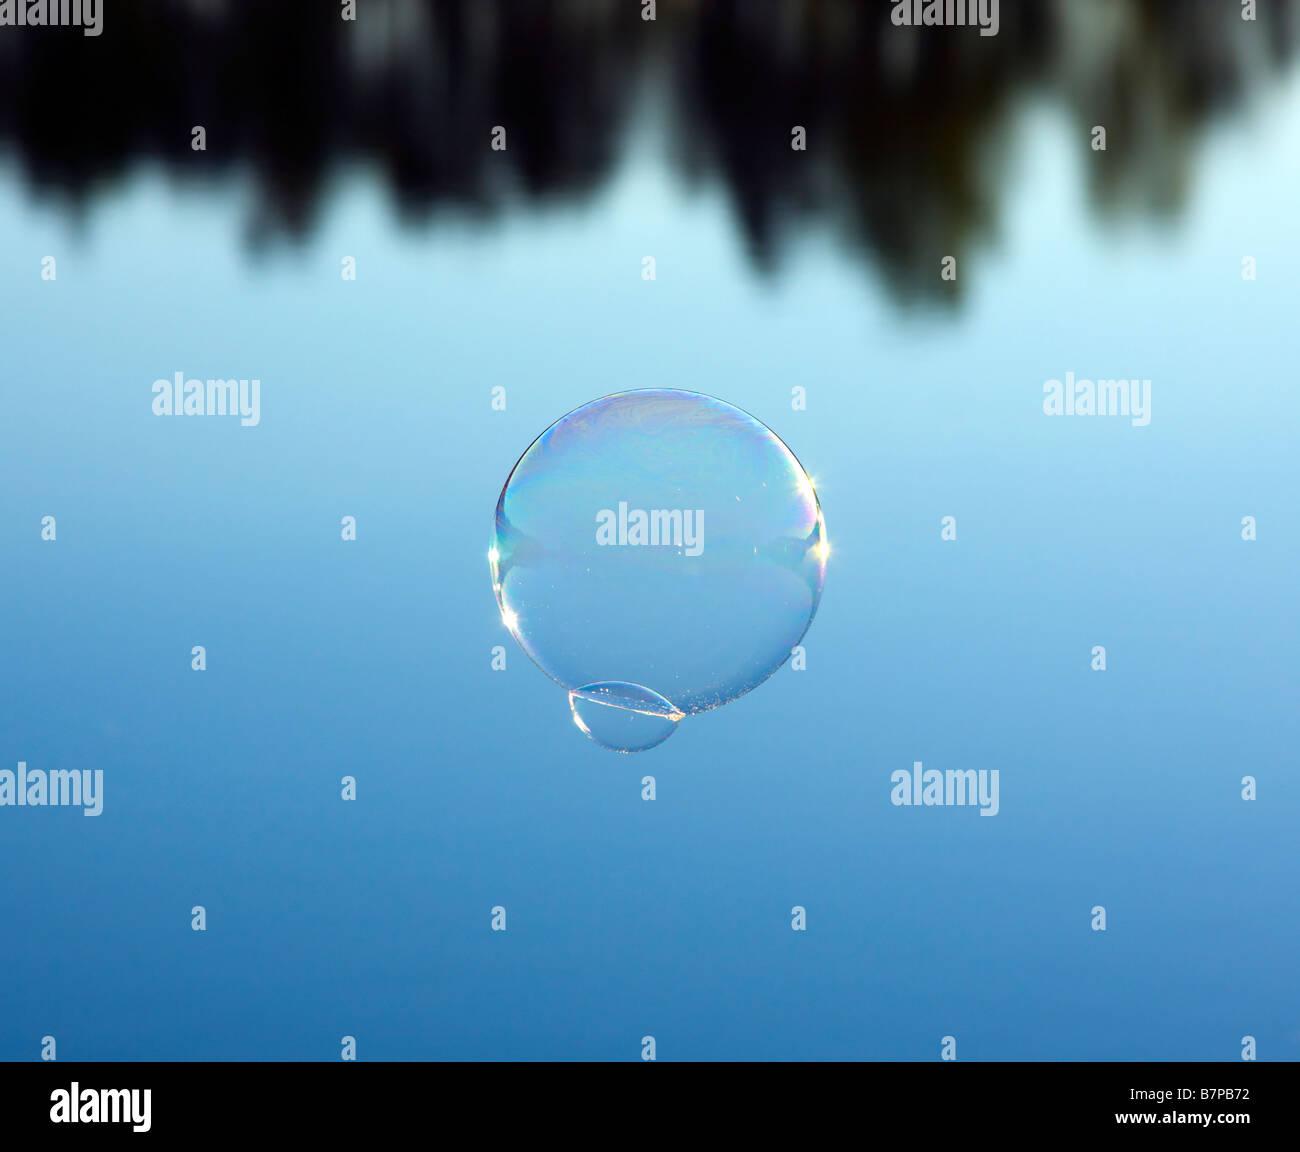 Bubble sobrevuela el agua azul Imagen De Stock